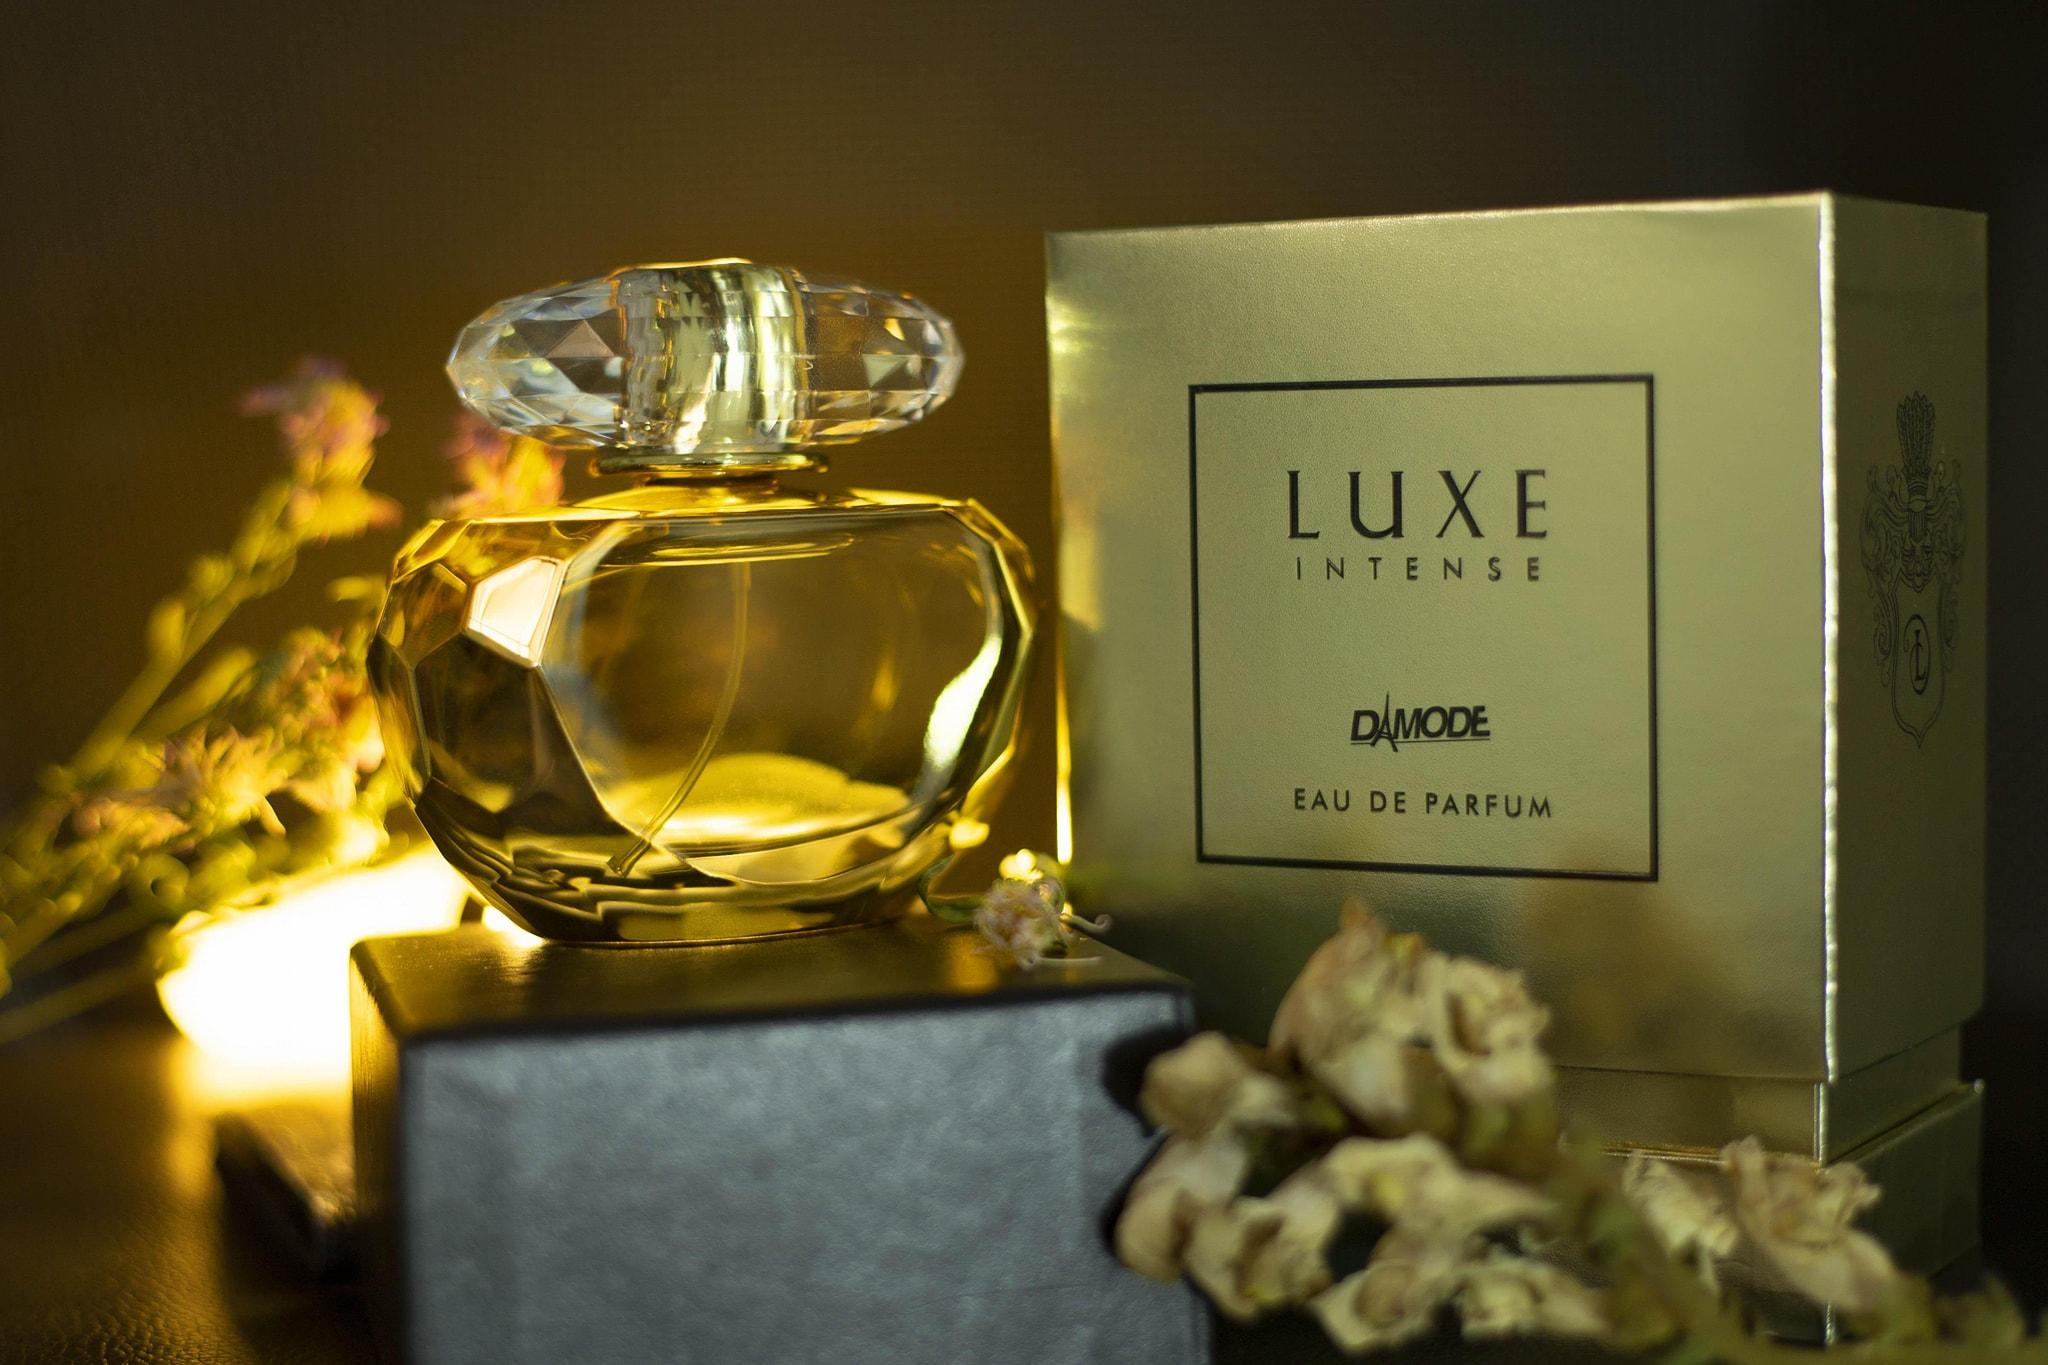 nuoc-hoa-luxe-2